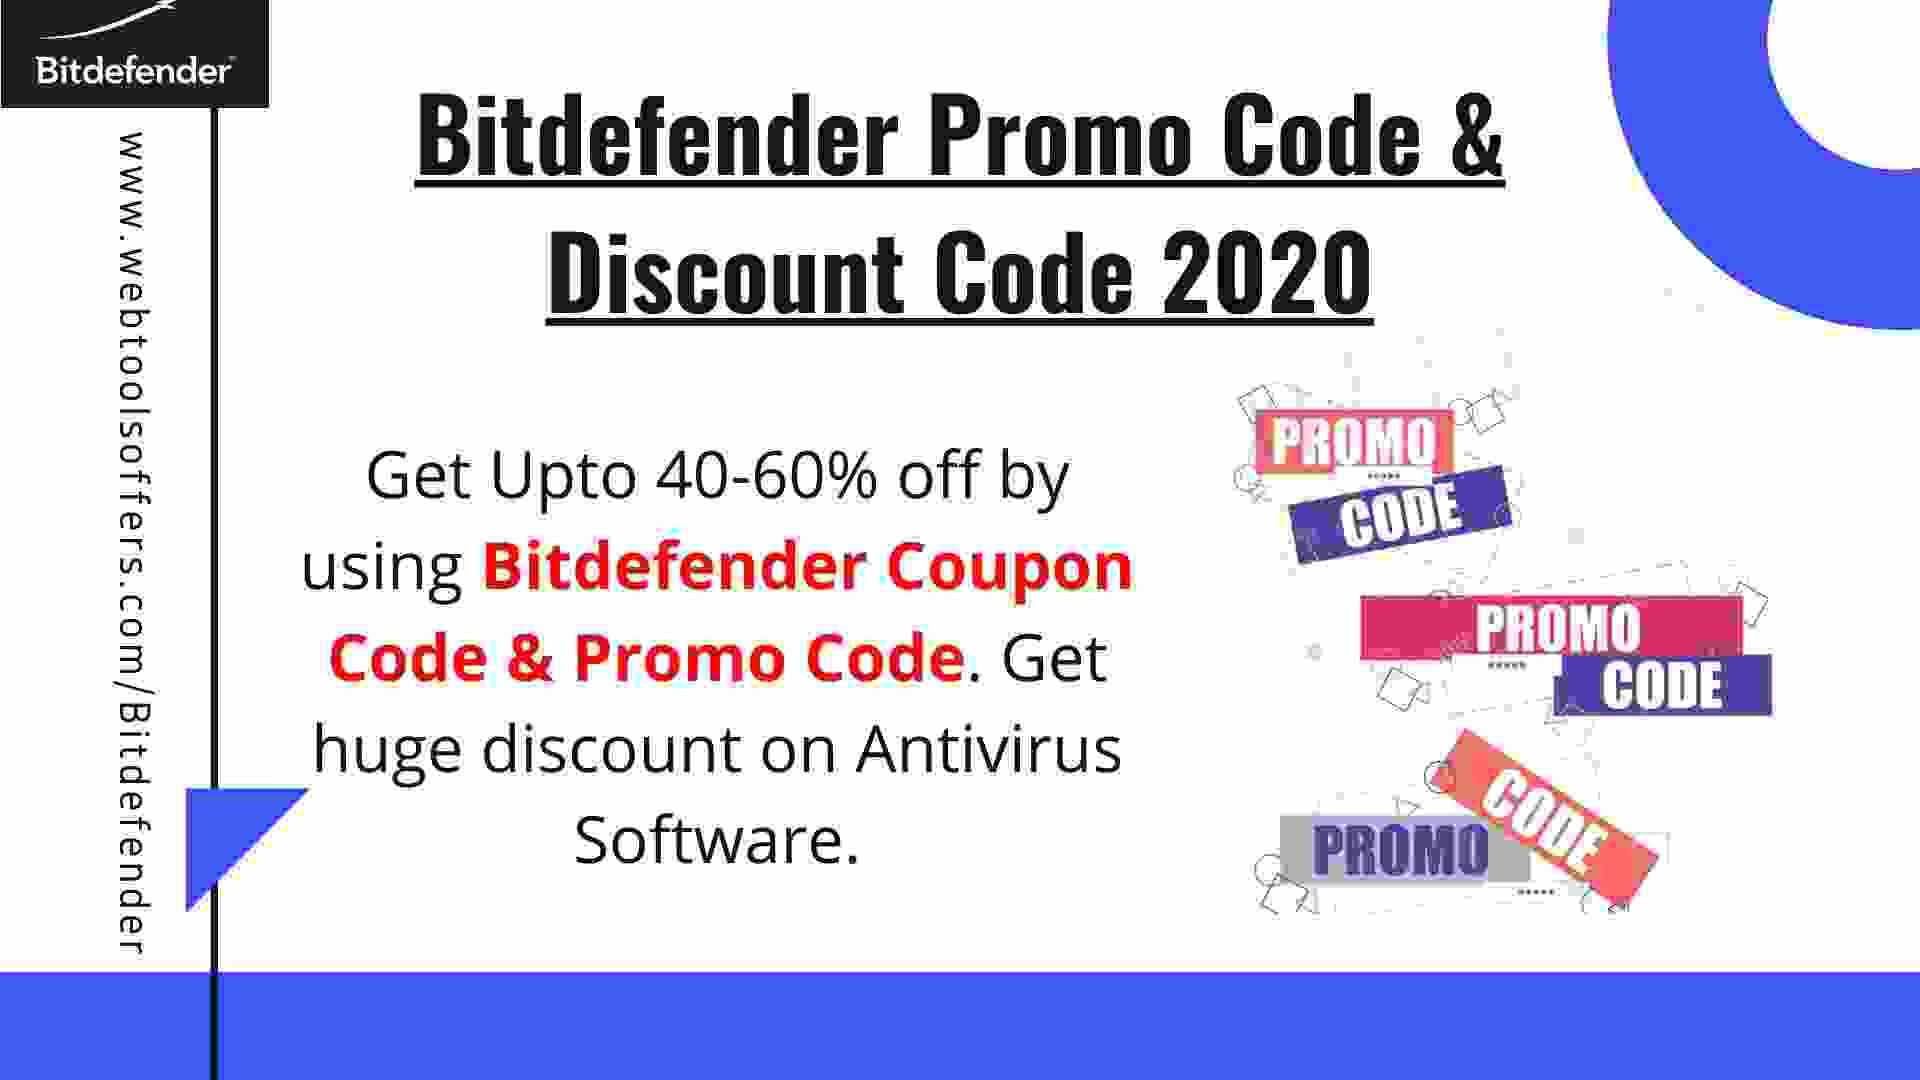 Bitdefender Promo Code